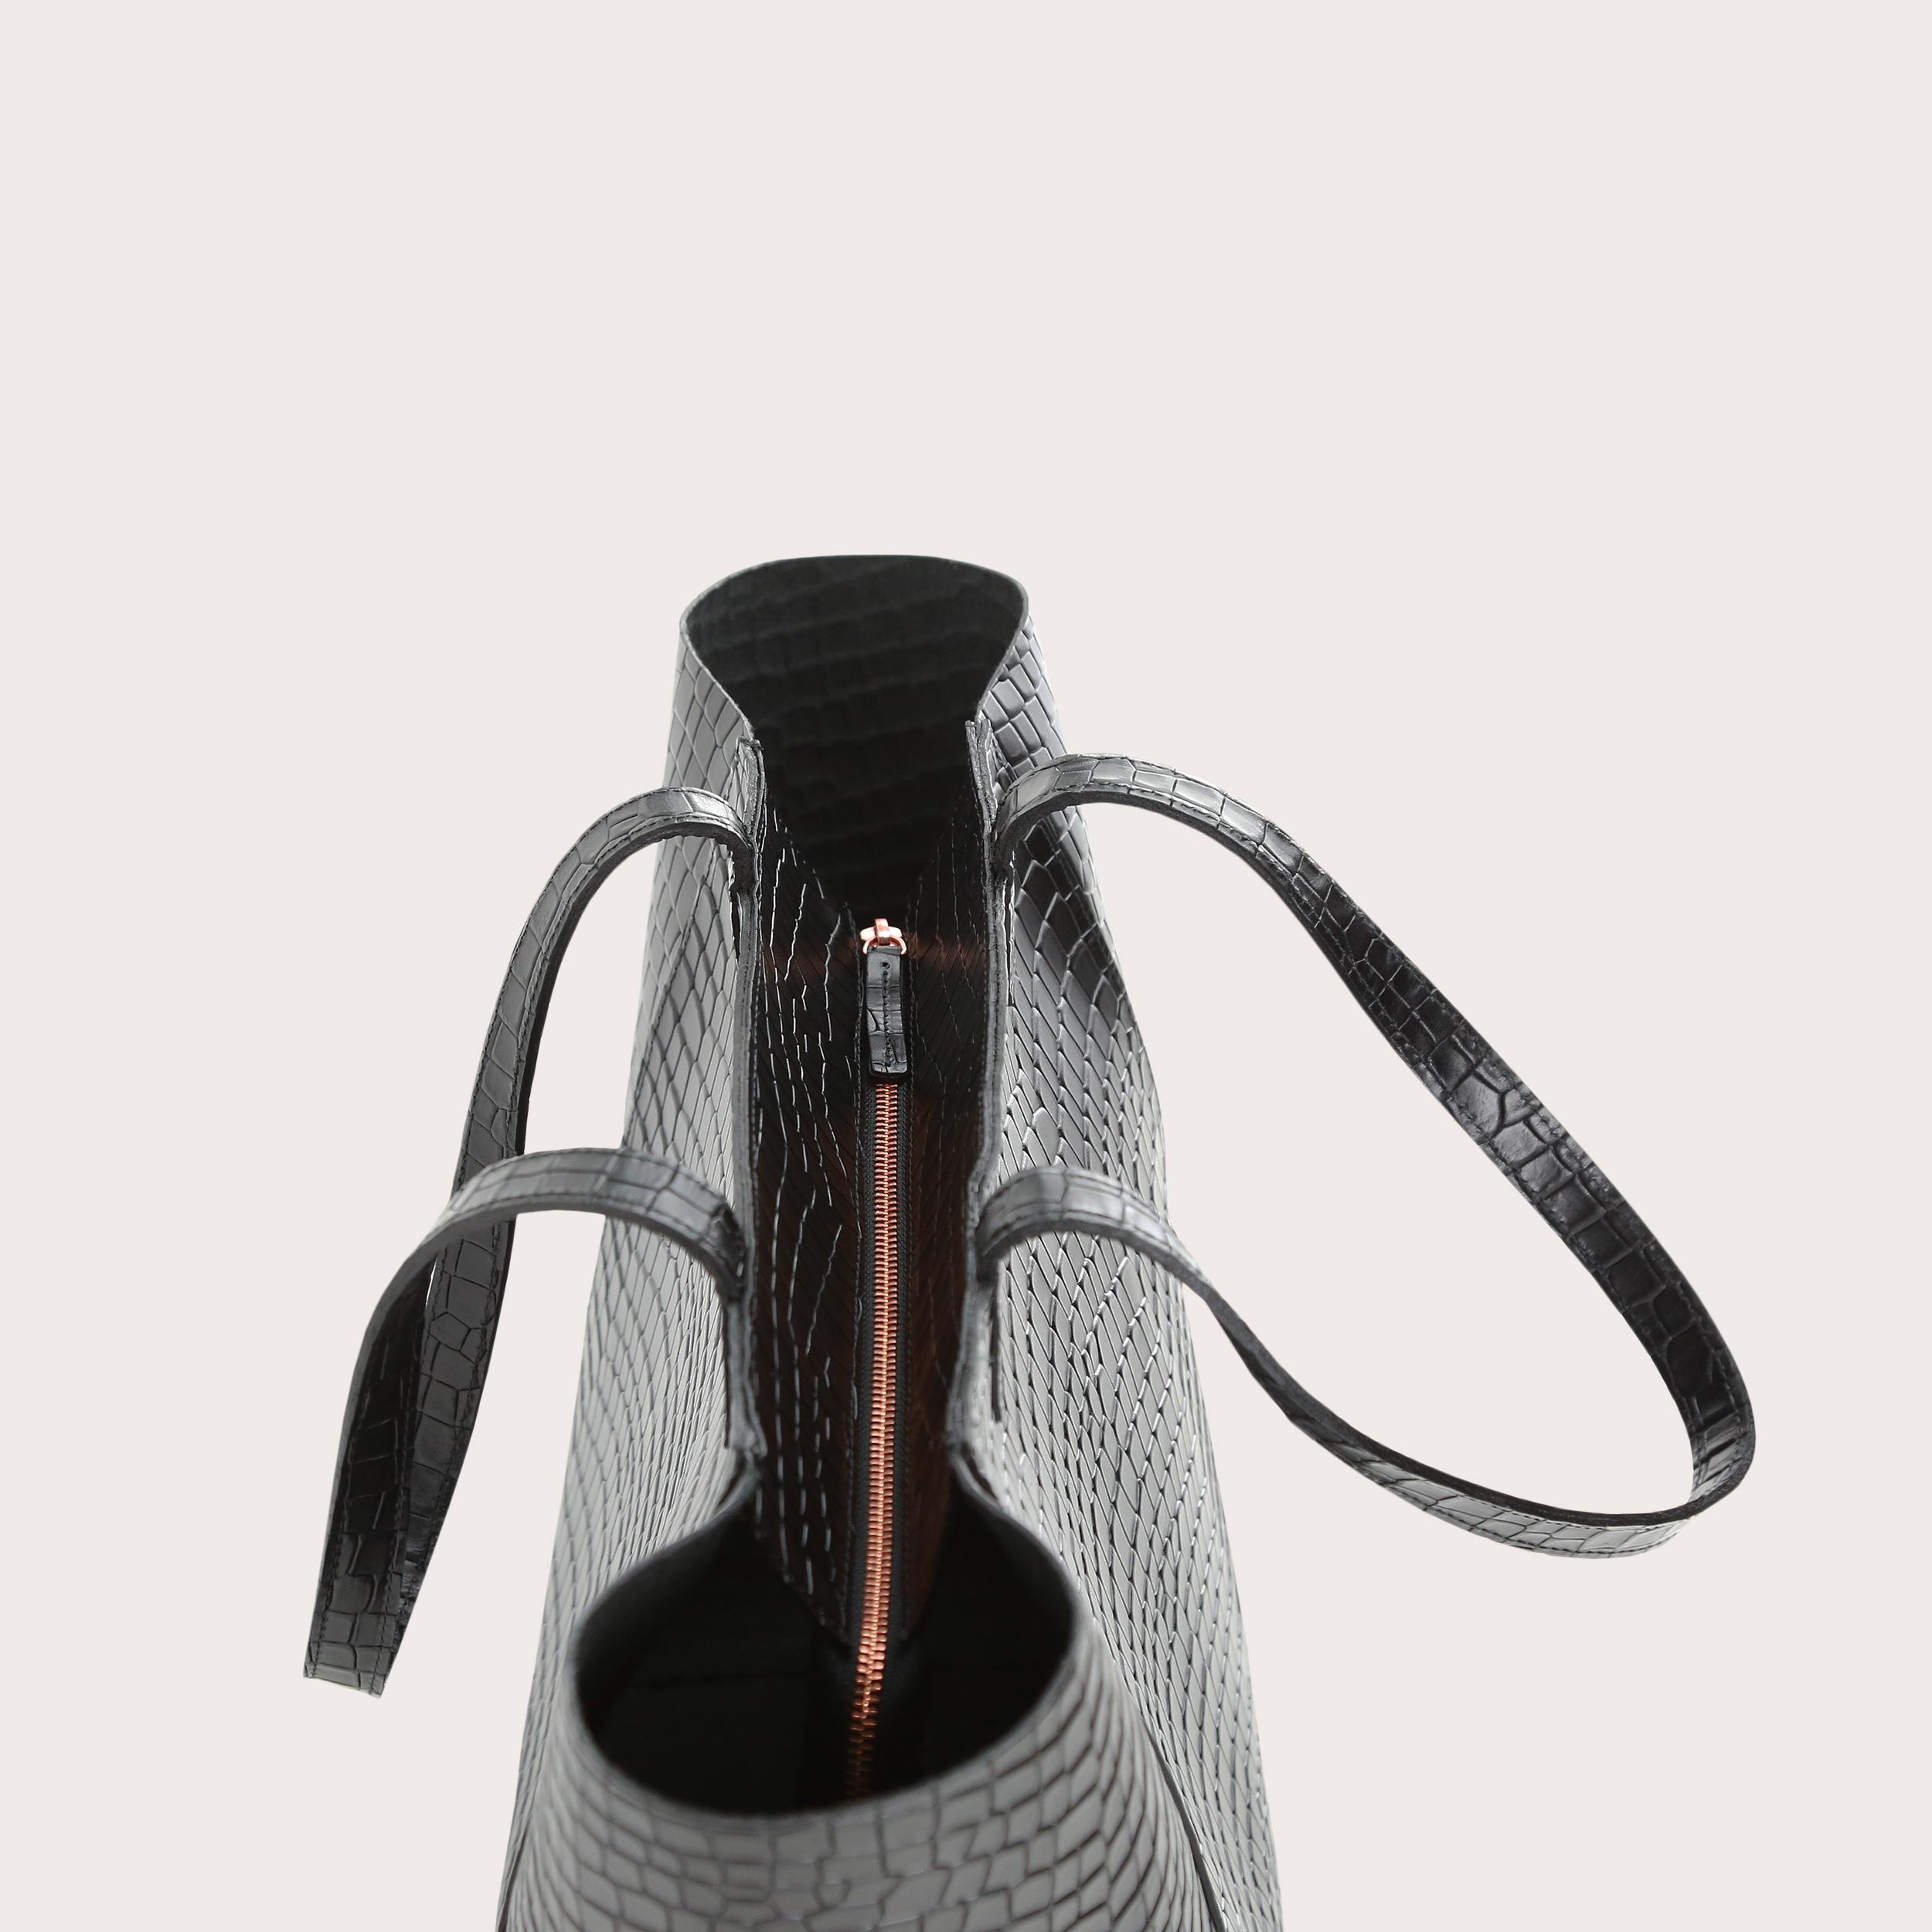 Torba ESTE Medium Zip Shopper Bag Croco Black 4